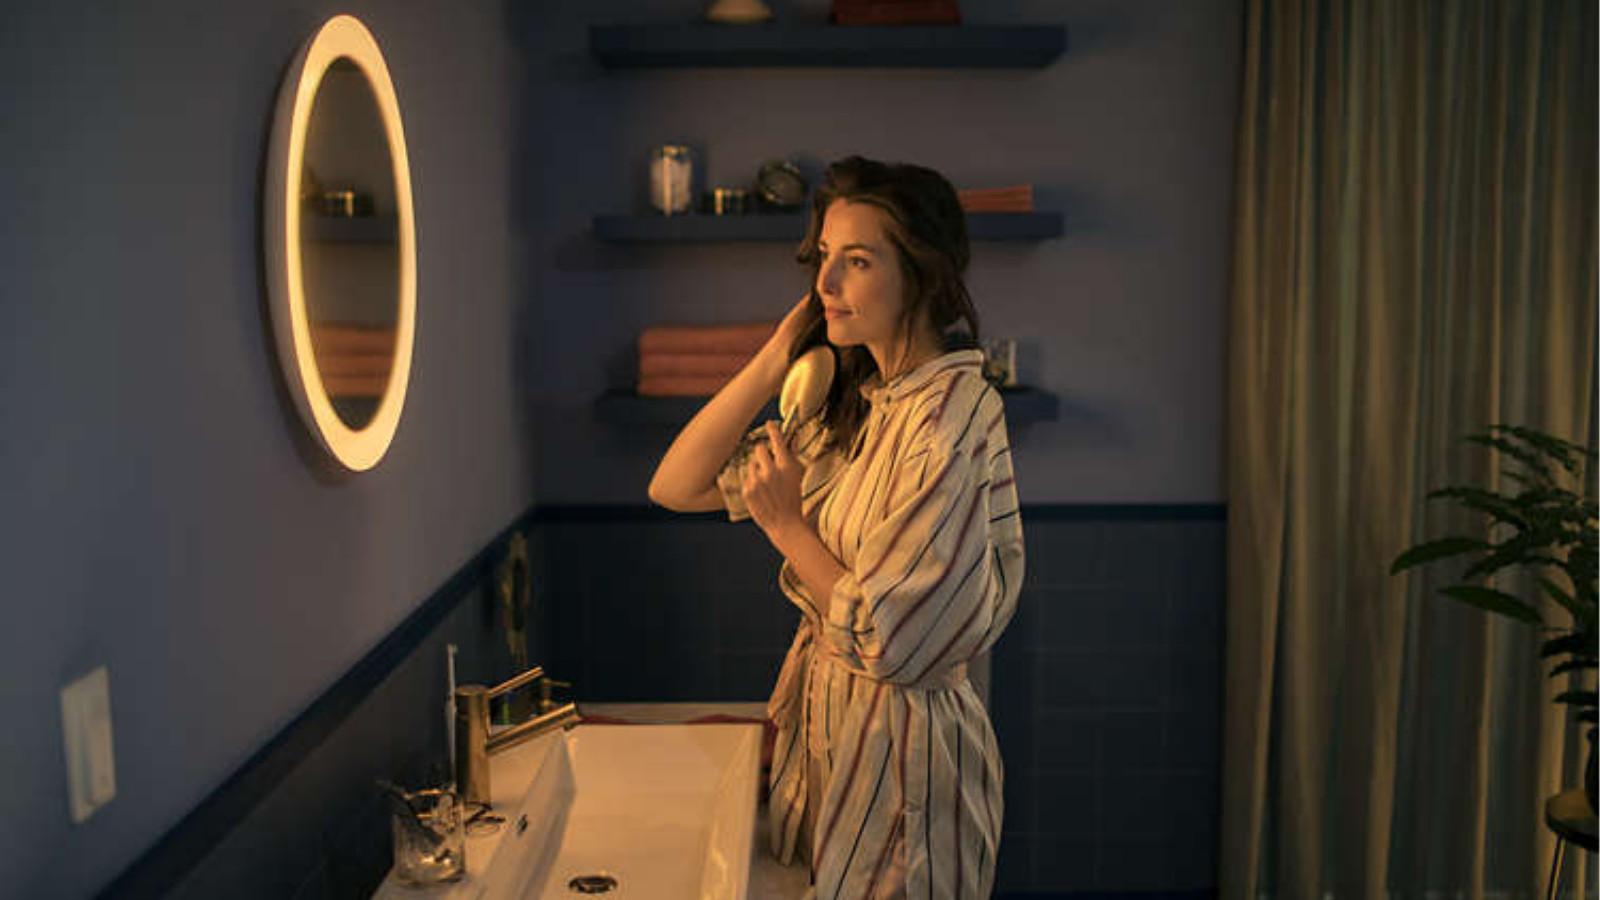 Frau vorm Philips Hue Adore Bathroom